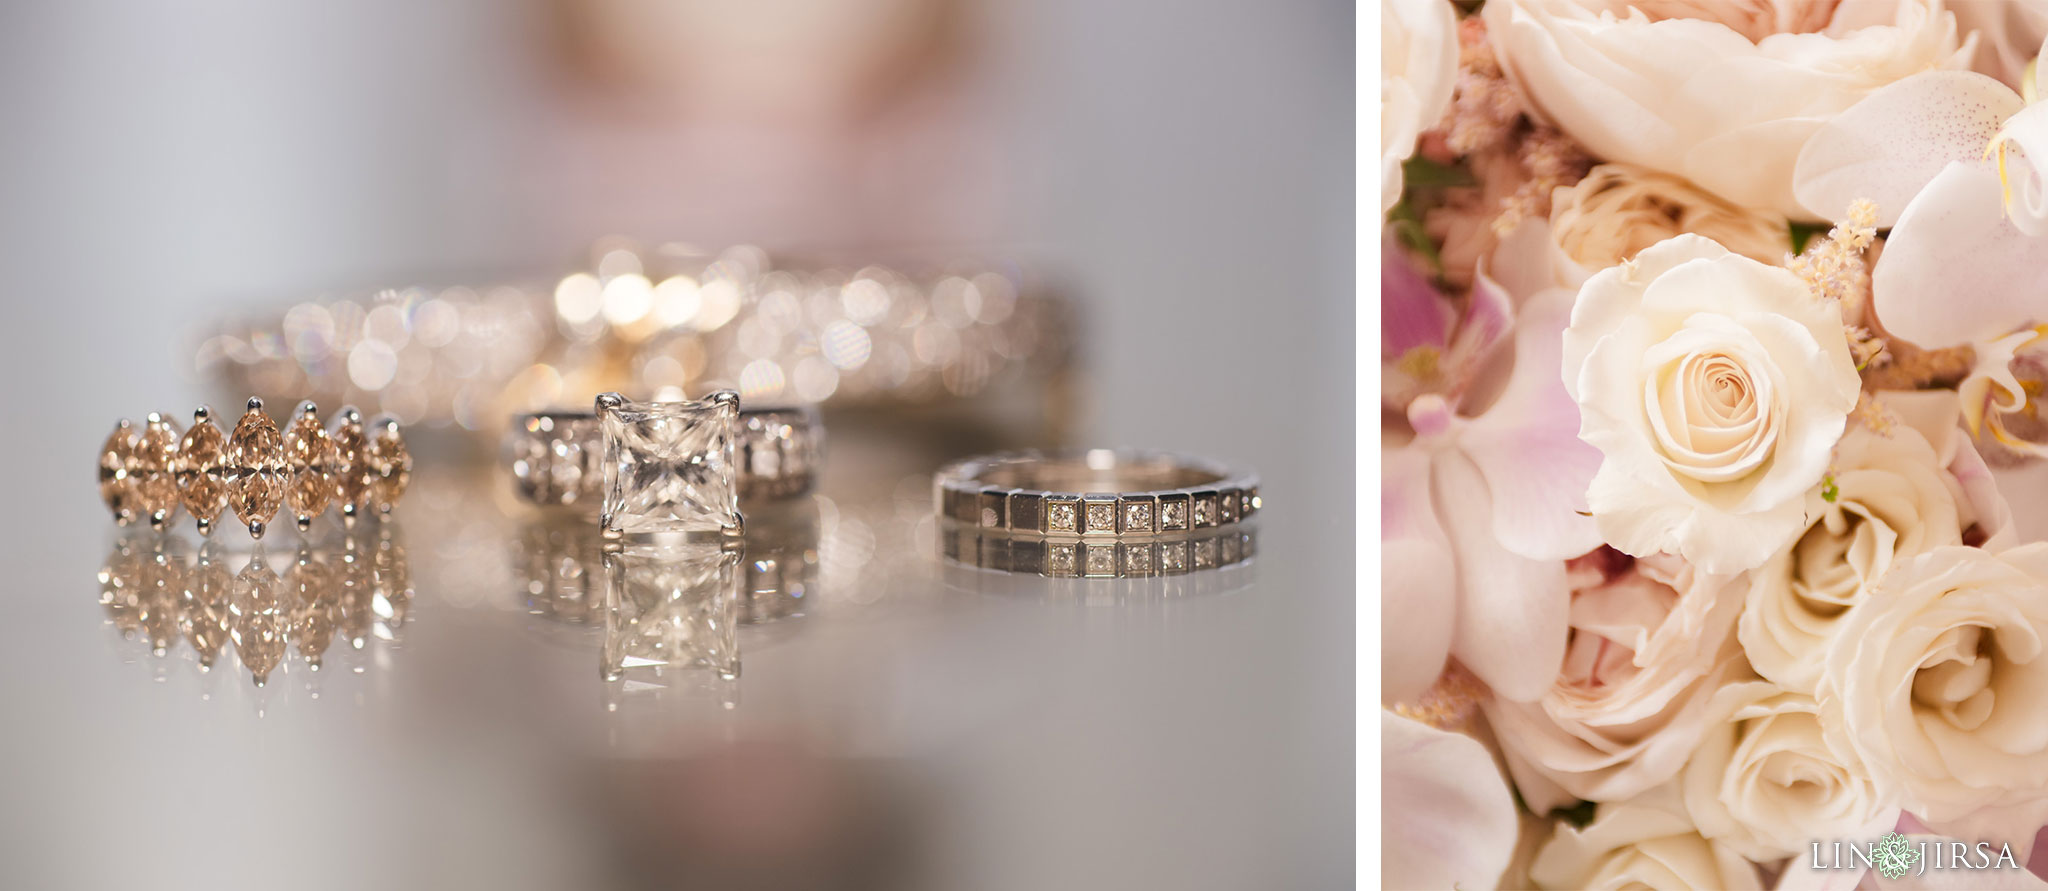 002 millennium biltmore hotel los angeles wedding photography